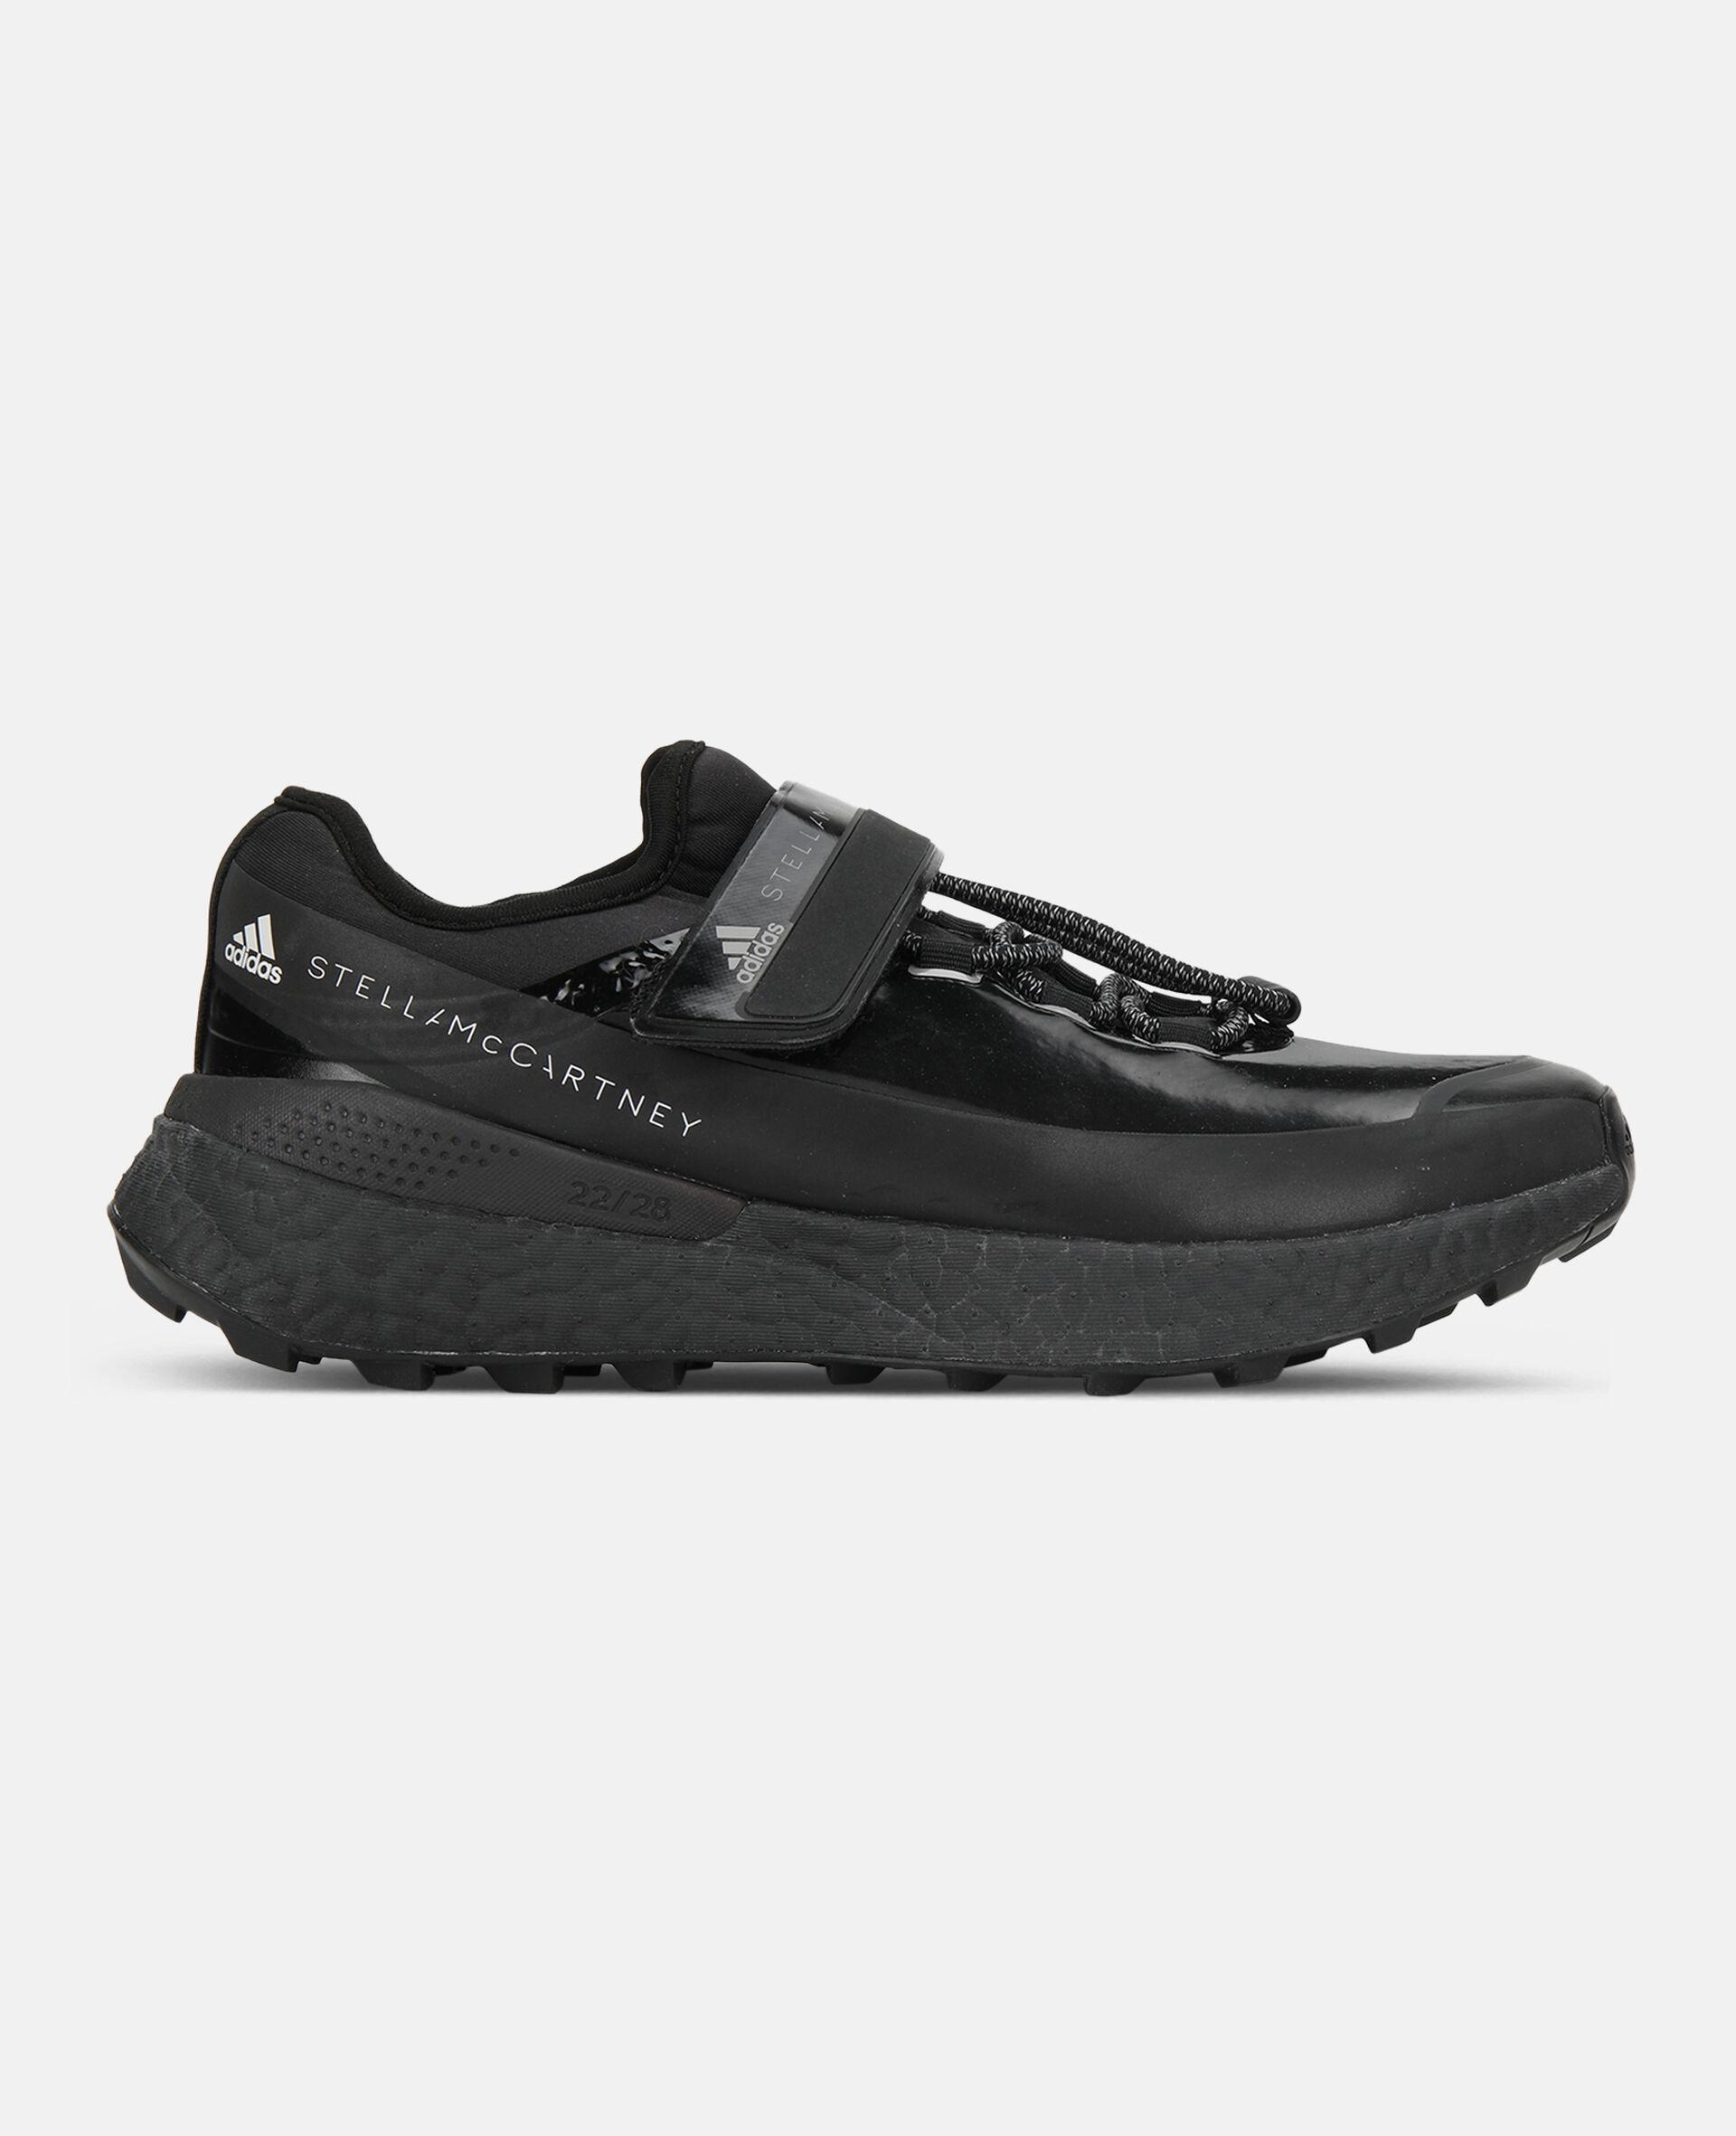 Chaussures de running Outdoor Boost rain.rdy noires -Noir-large image number 0